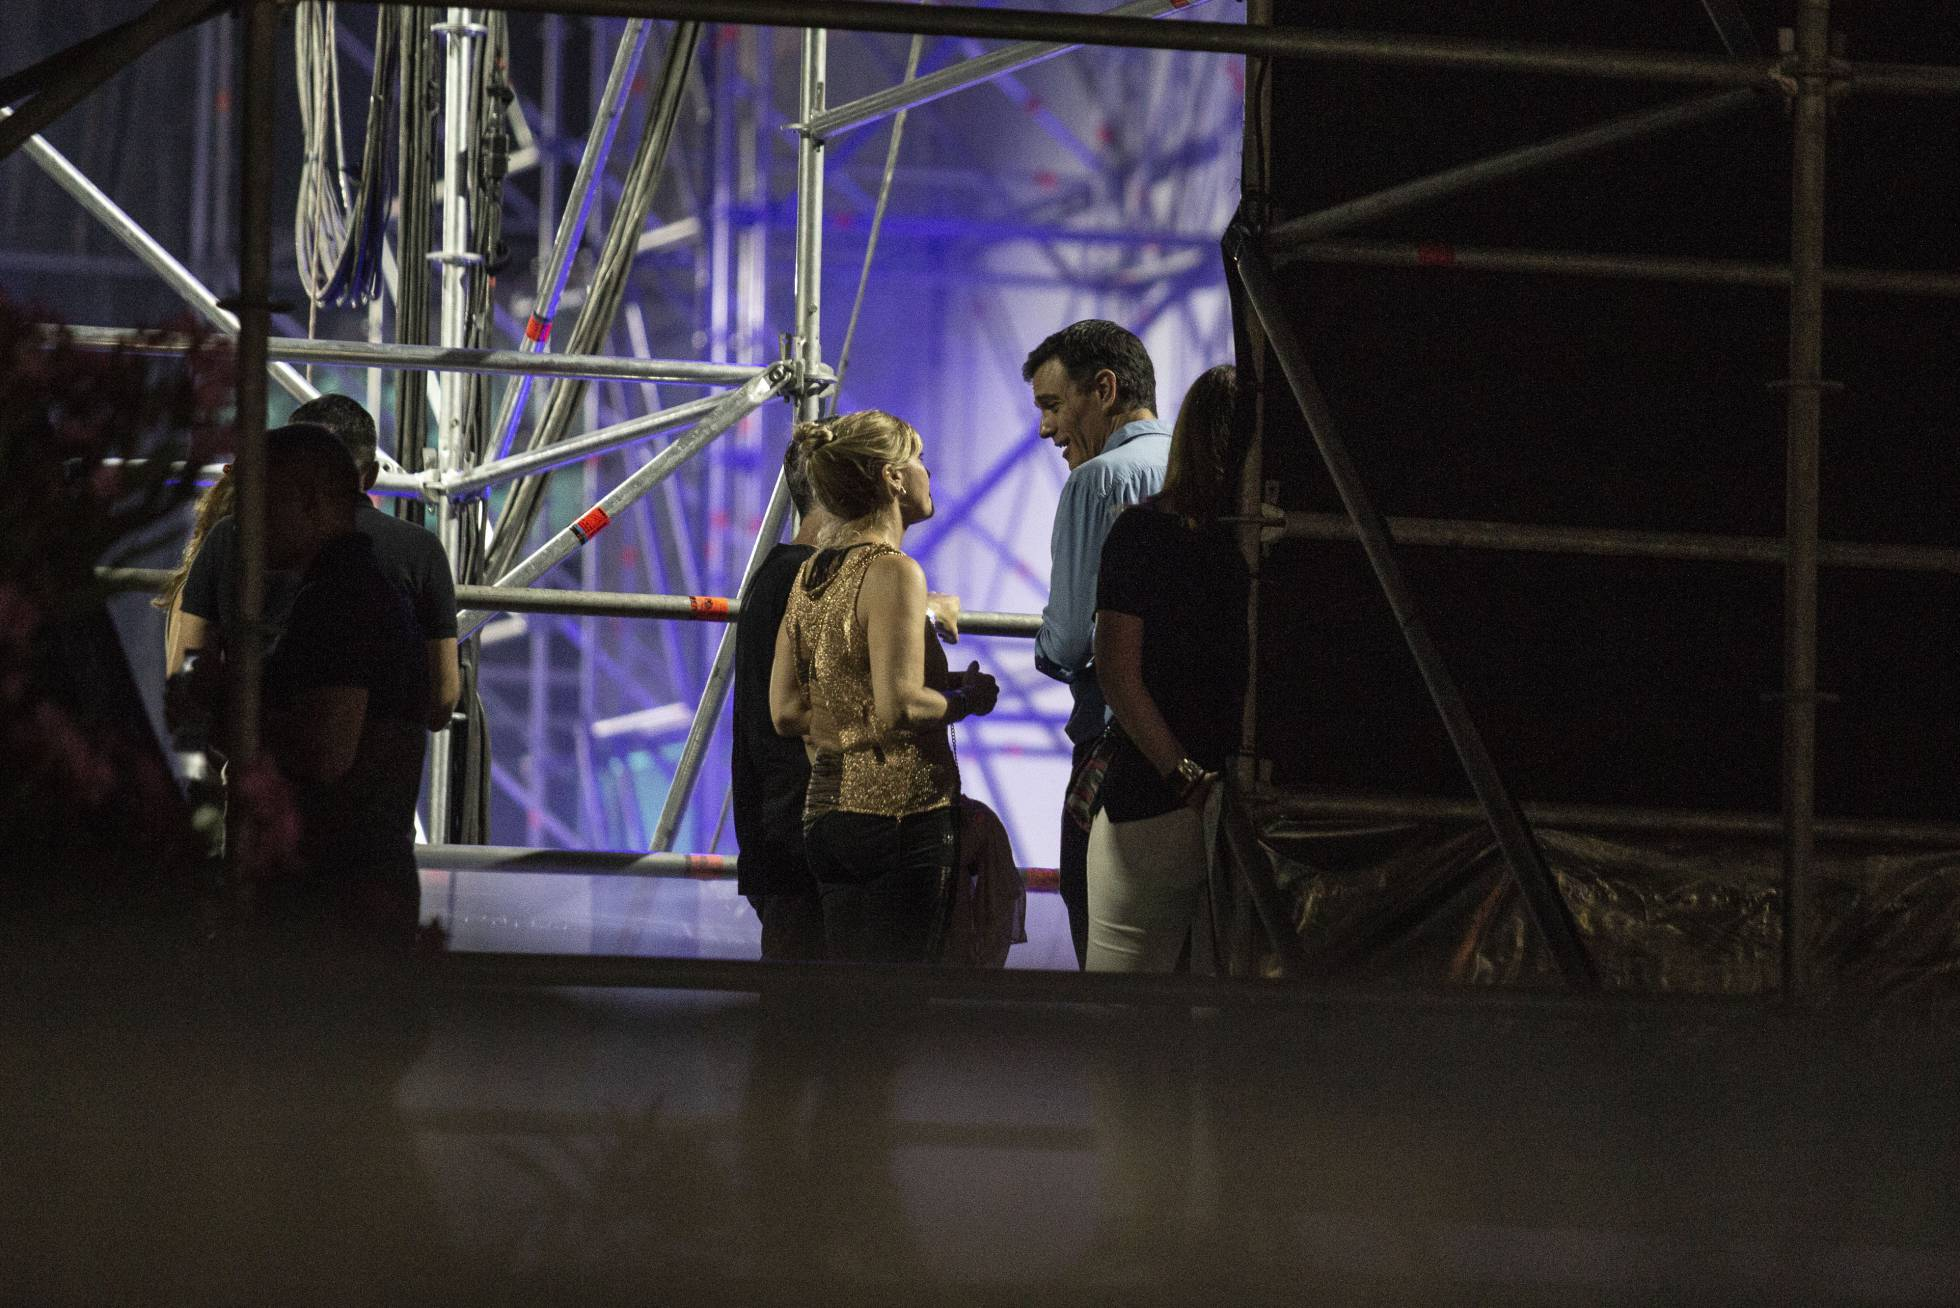 Премьер-министр Испании посетил концерт The Killers на музыкальном фестивале FIB